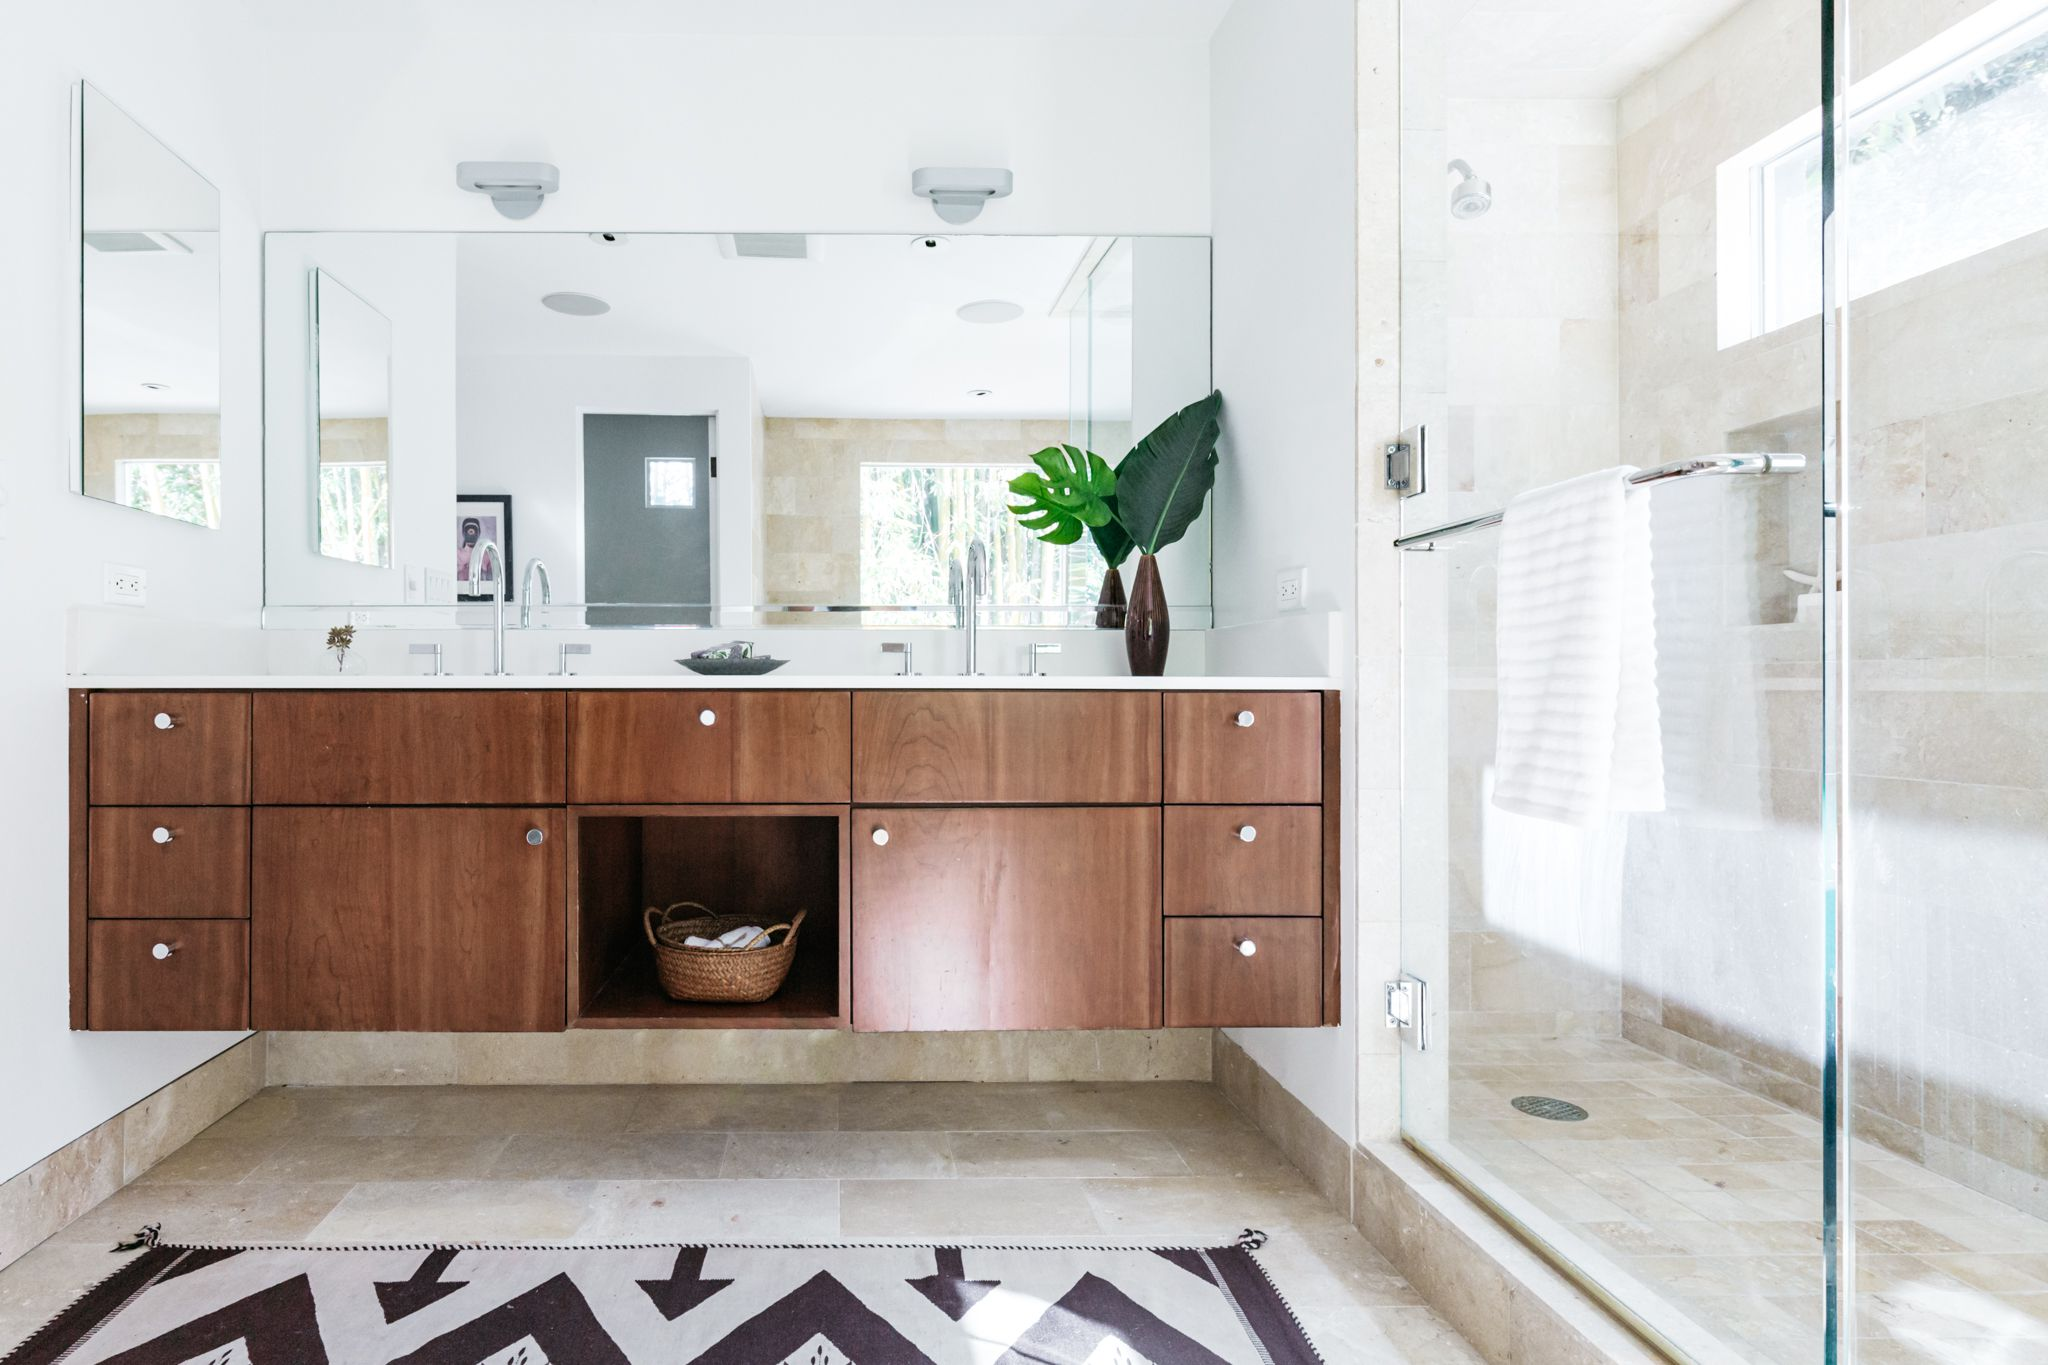 bathroom-design-ideas-and-inspiration-4101873-hero-c194d168c4aa4607b2f9a345c778d750